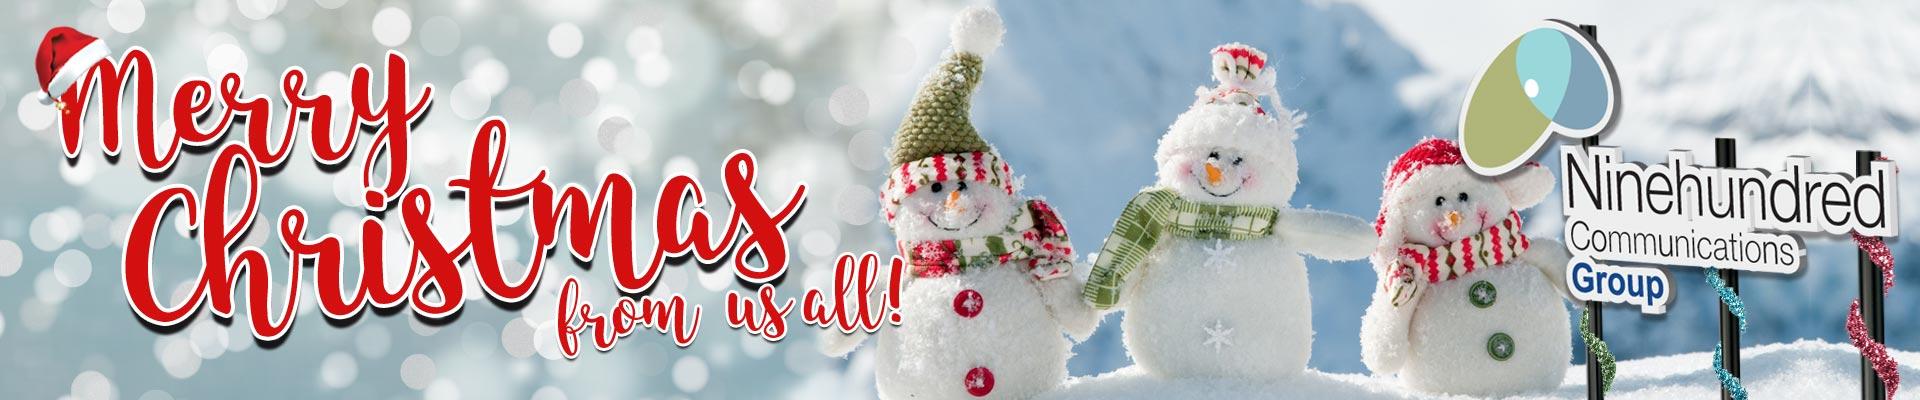 Merry Christmas from Ninehundred Communications Group image